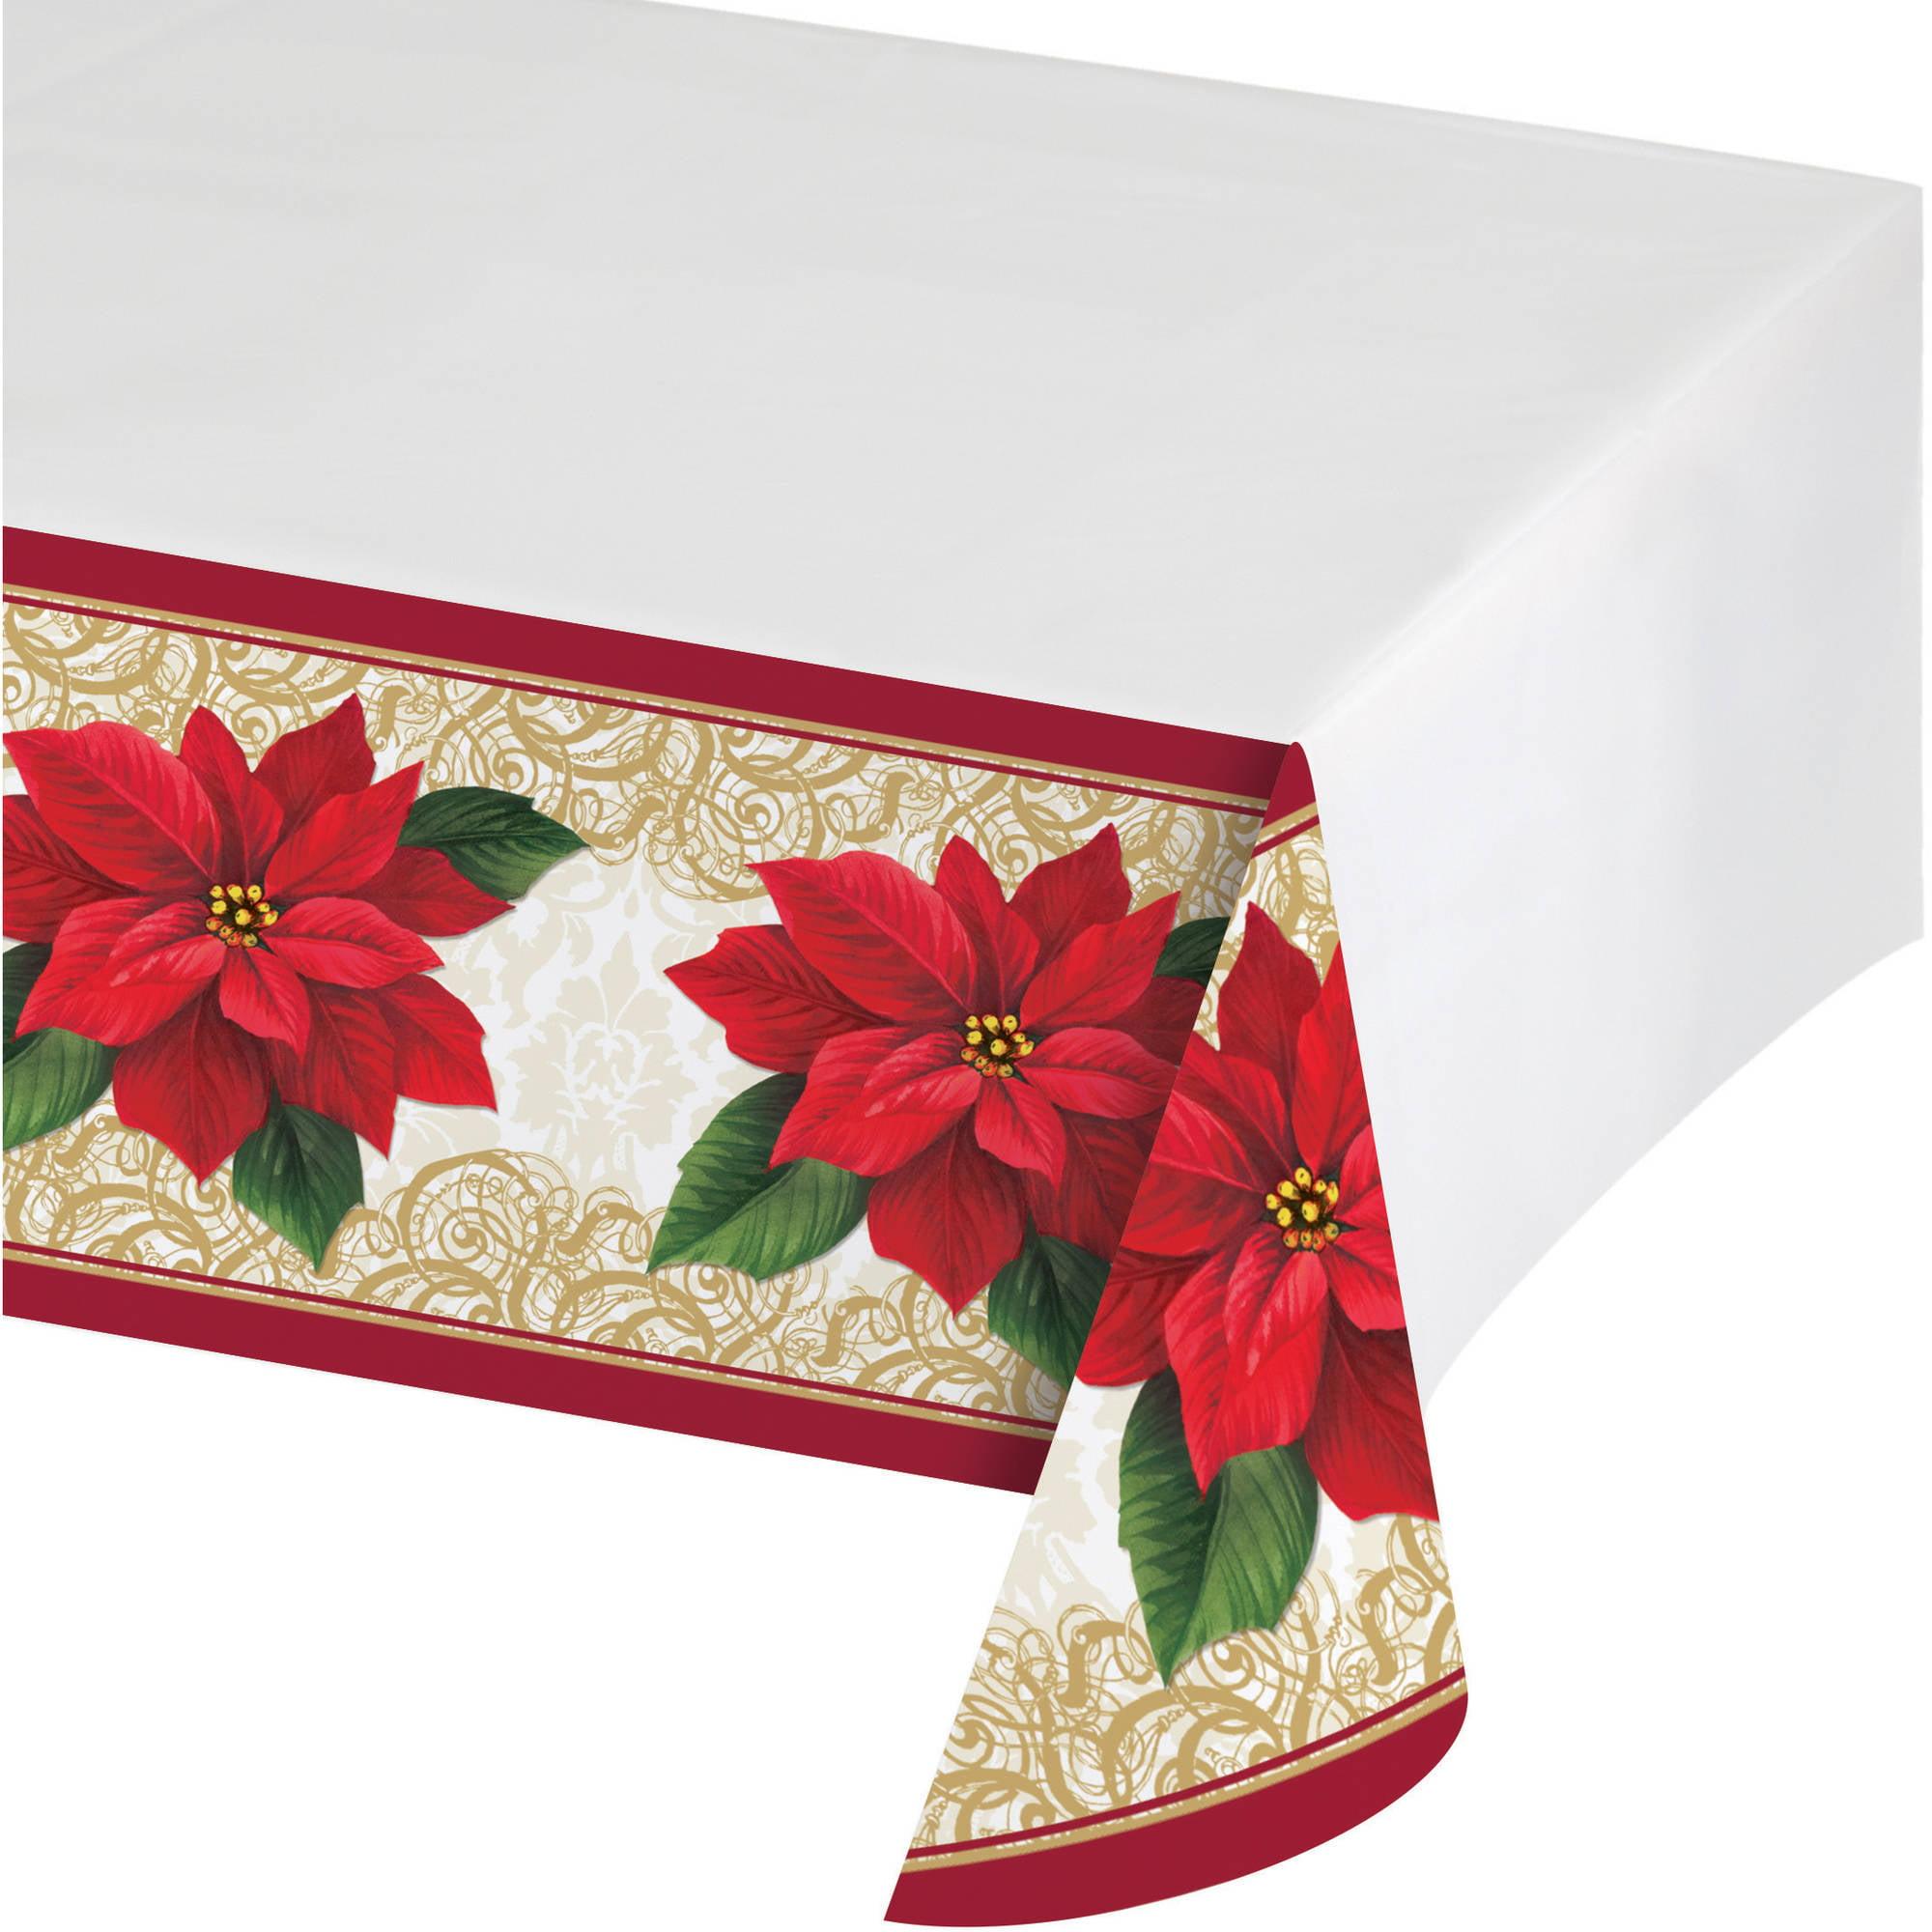 Poinsettia Lace Plastic Tablecloth